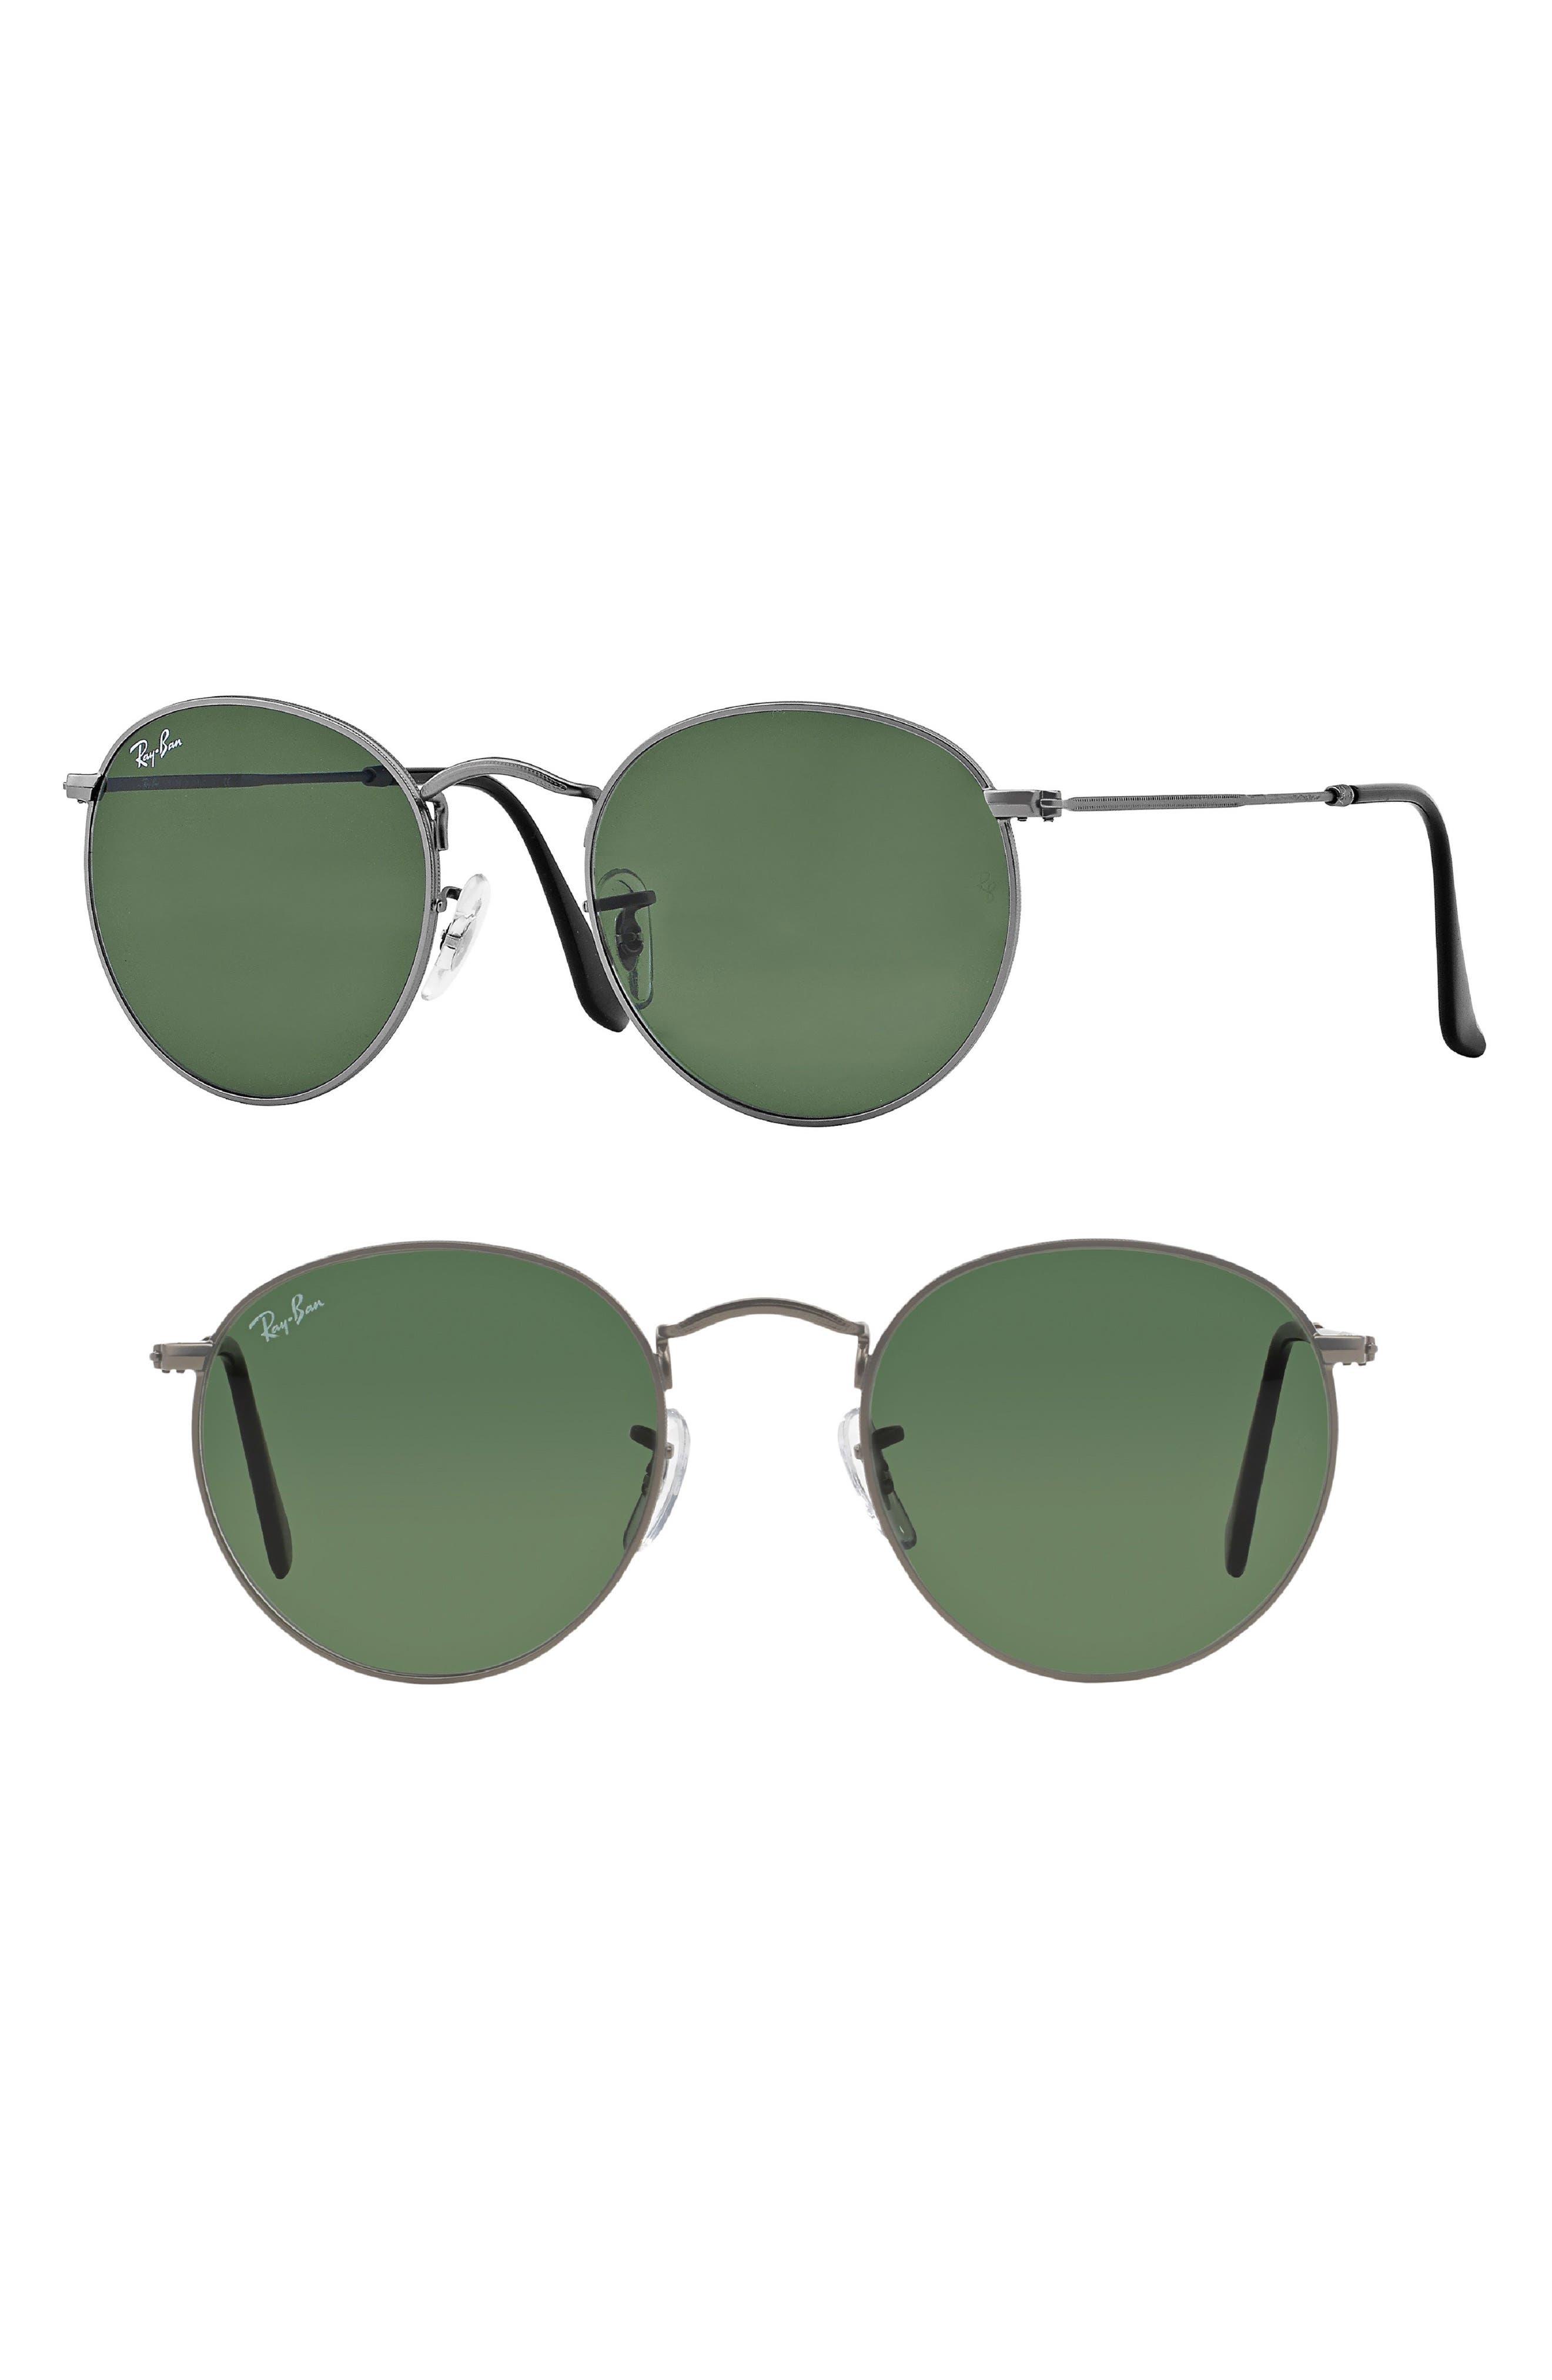 Icons 53mm Retro Sunglasses,                             Main thumbnail 1, color,                             GUN/ GREEN SOLID